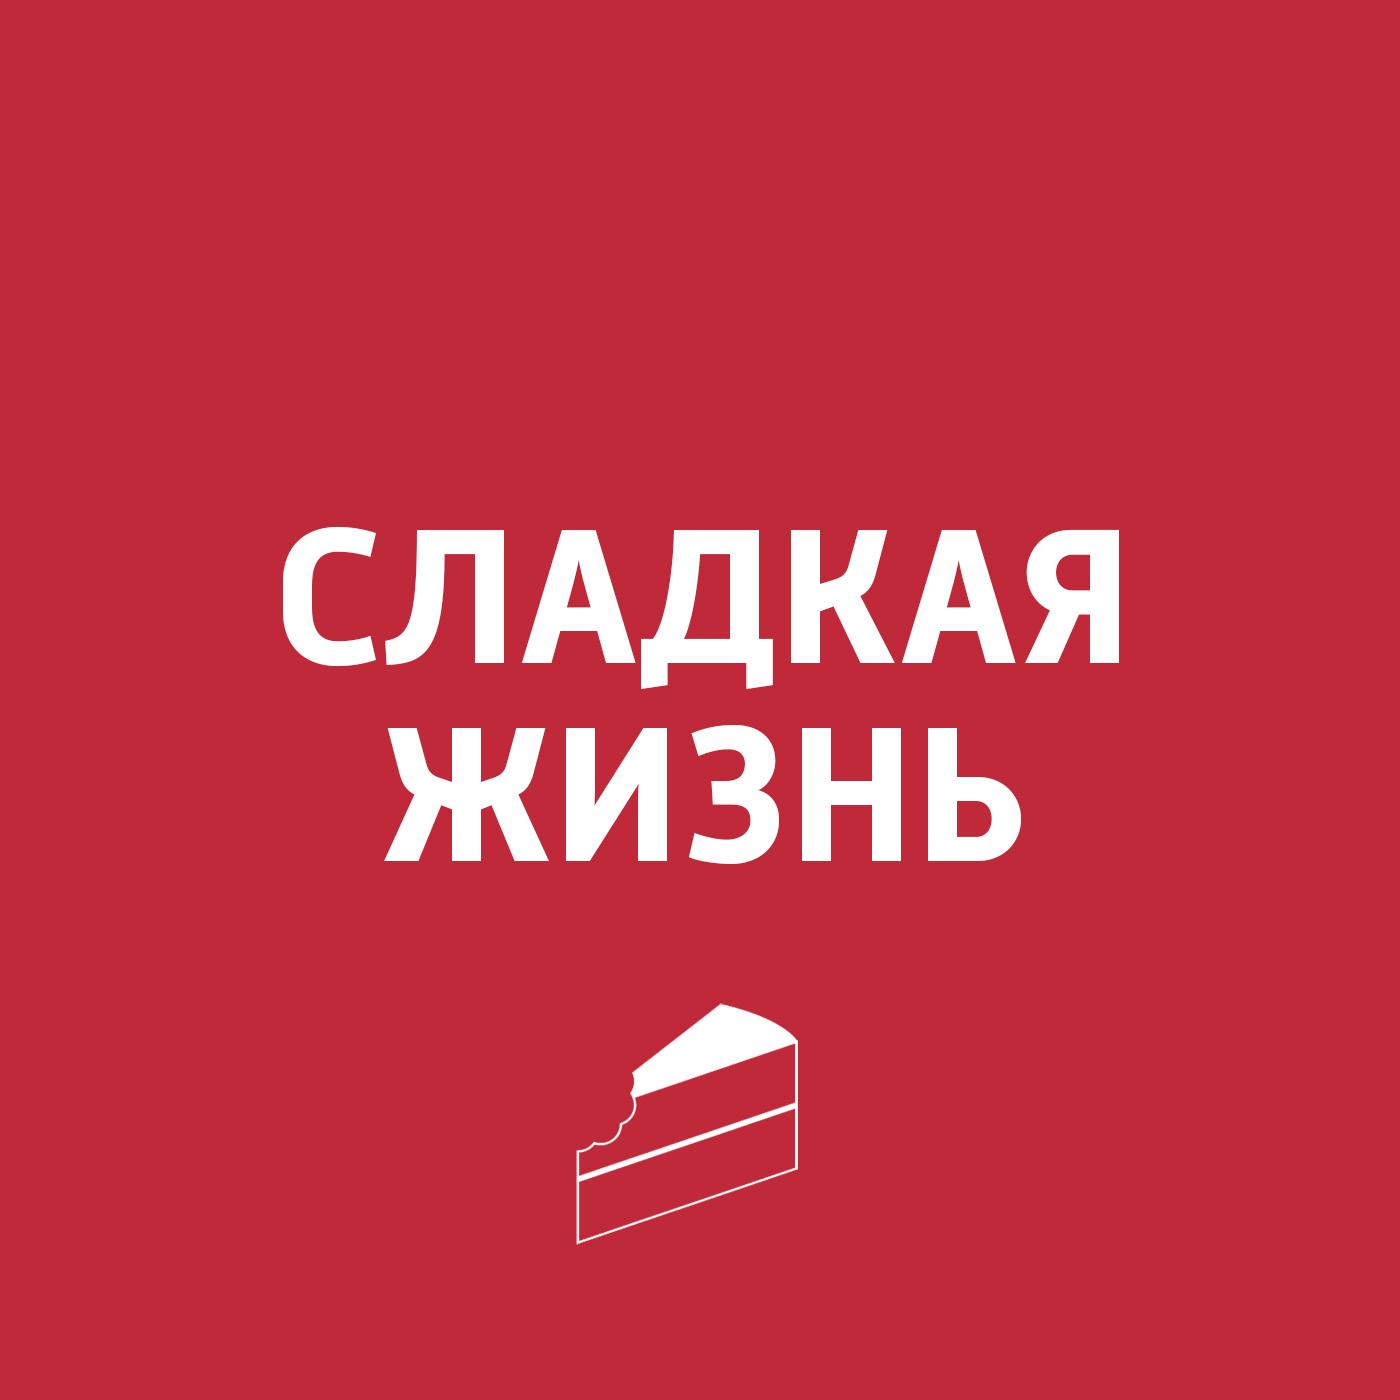 Картаев Павел Хворост картаев павел гулабджамун